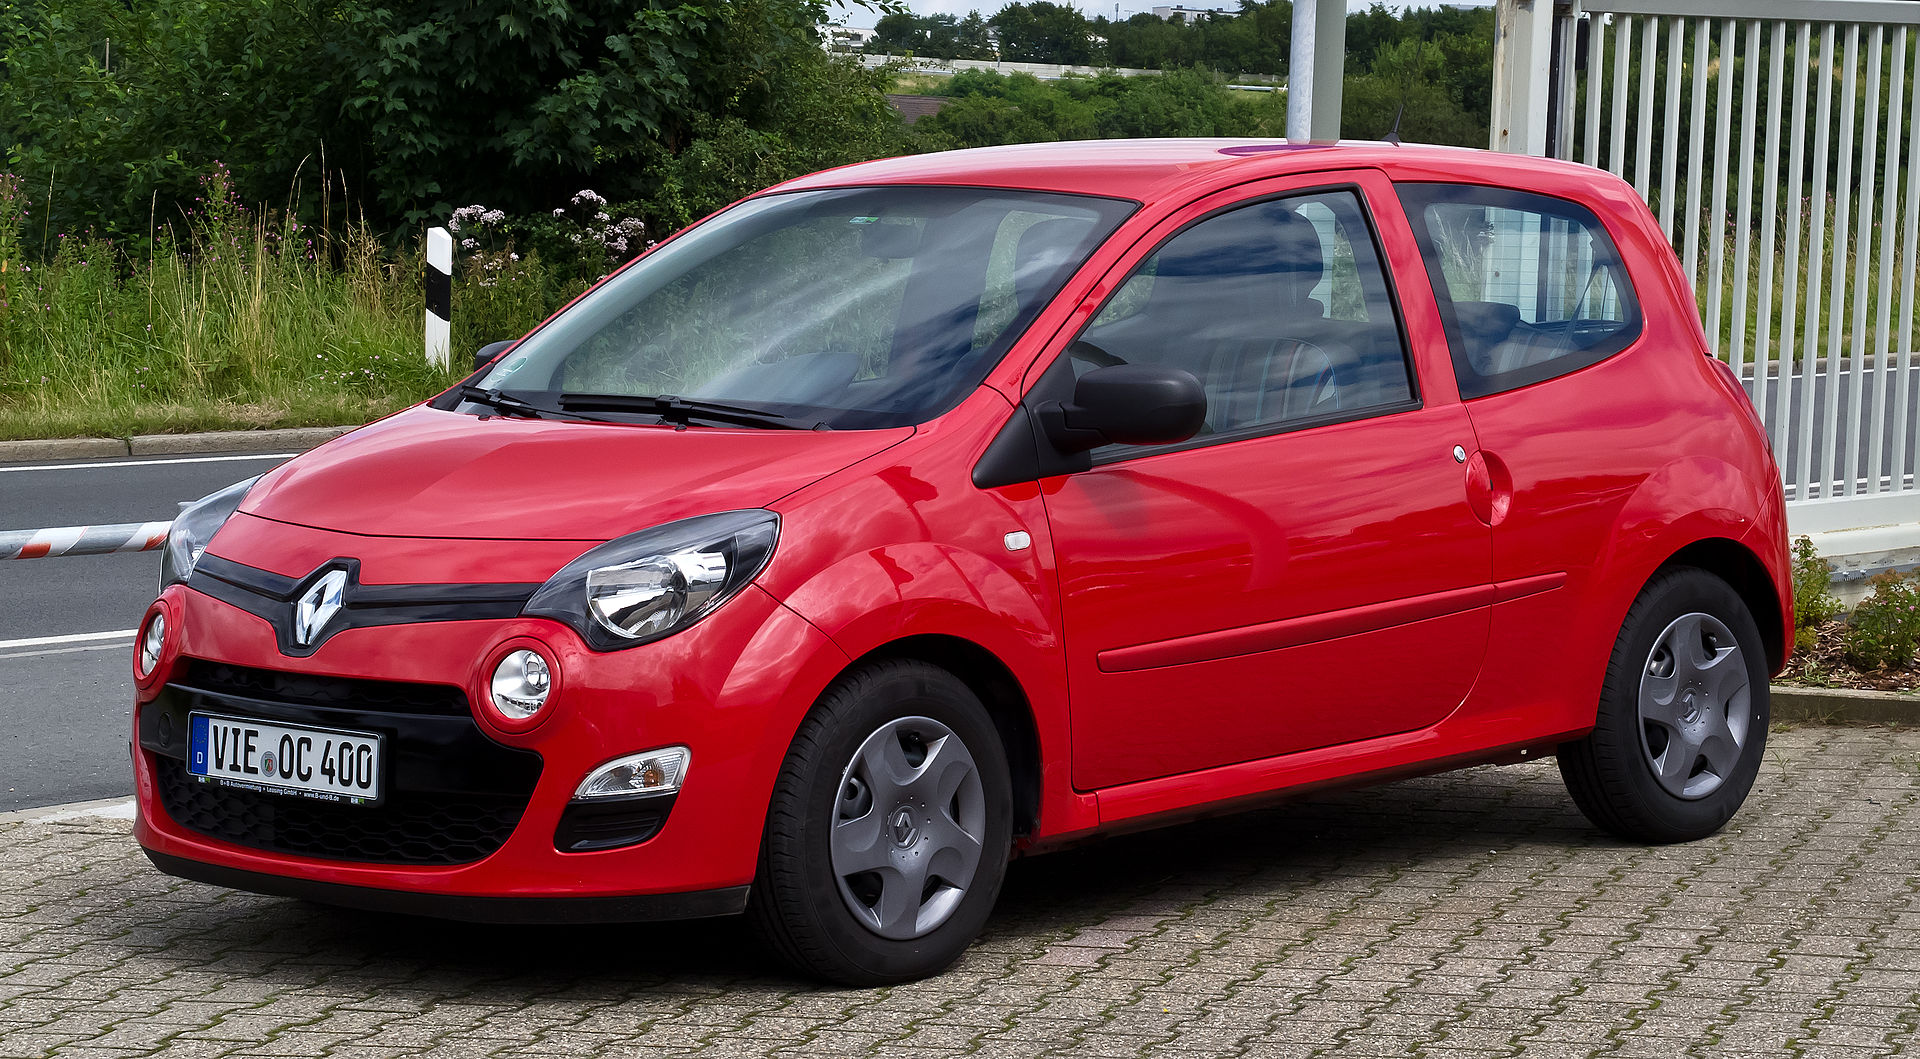 Renault Twingo (II, Facelift) – Frontansicht, 21. Juli 2012, Heiligenhaus.jpg